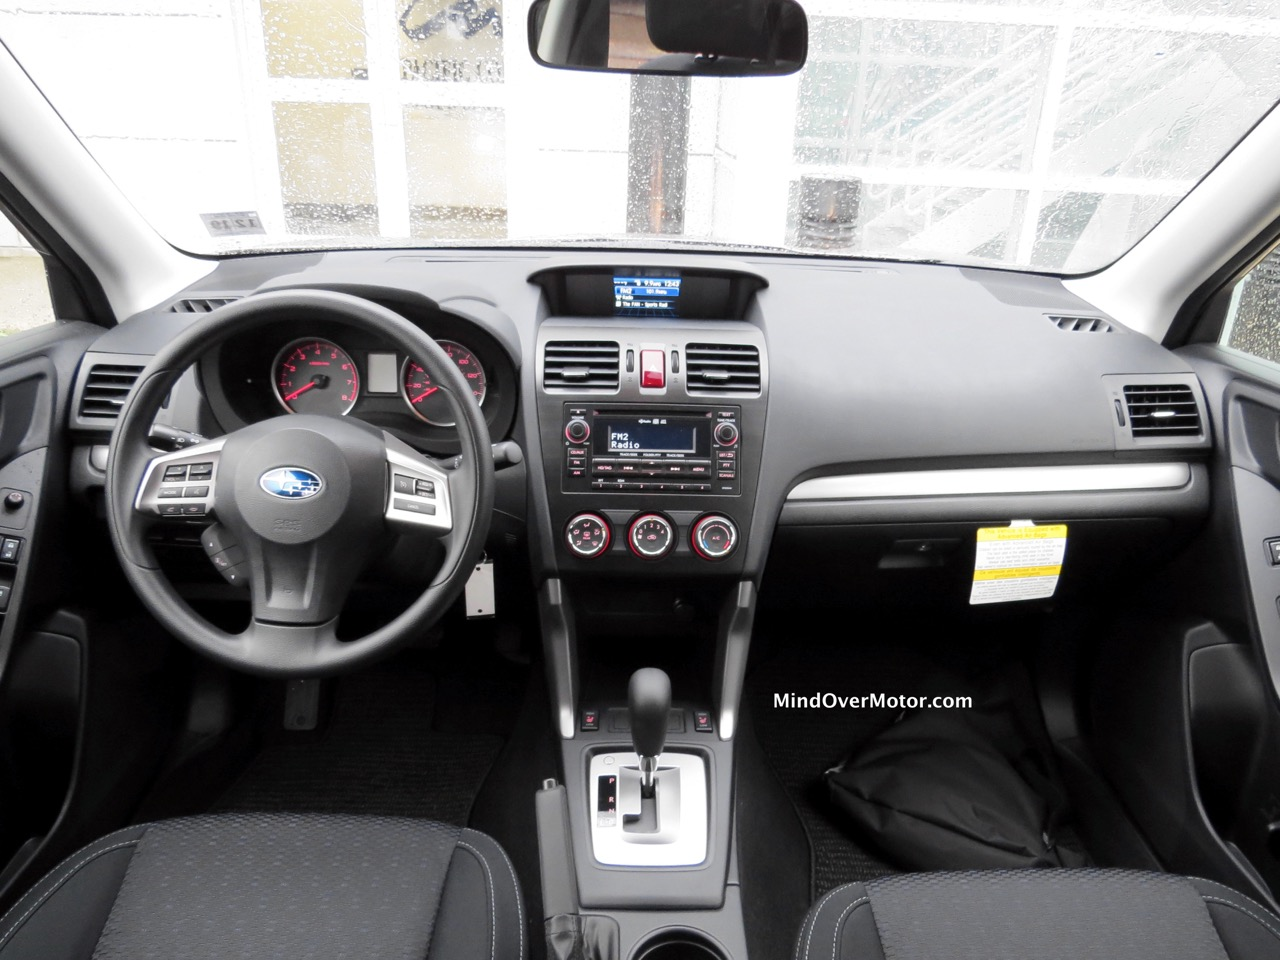 2015 Subaru Forester Front Interior